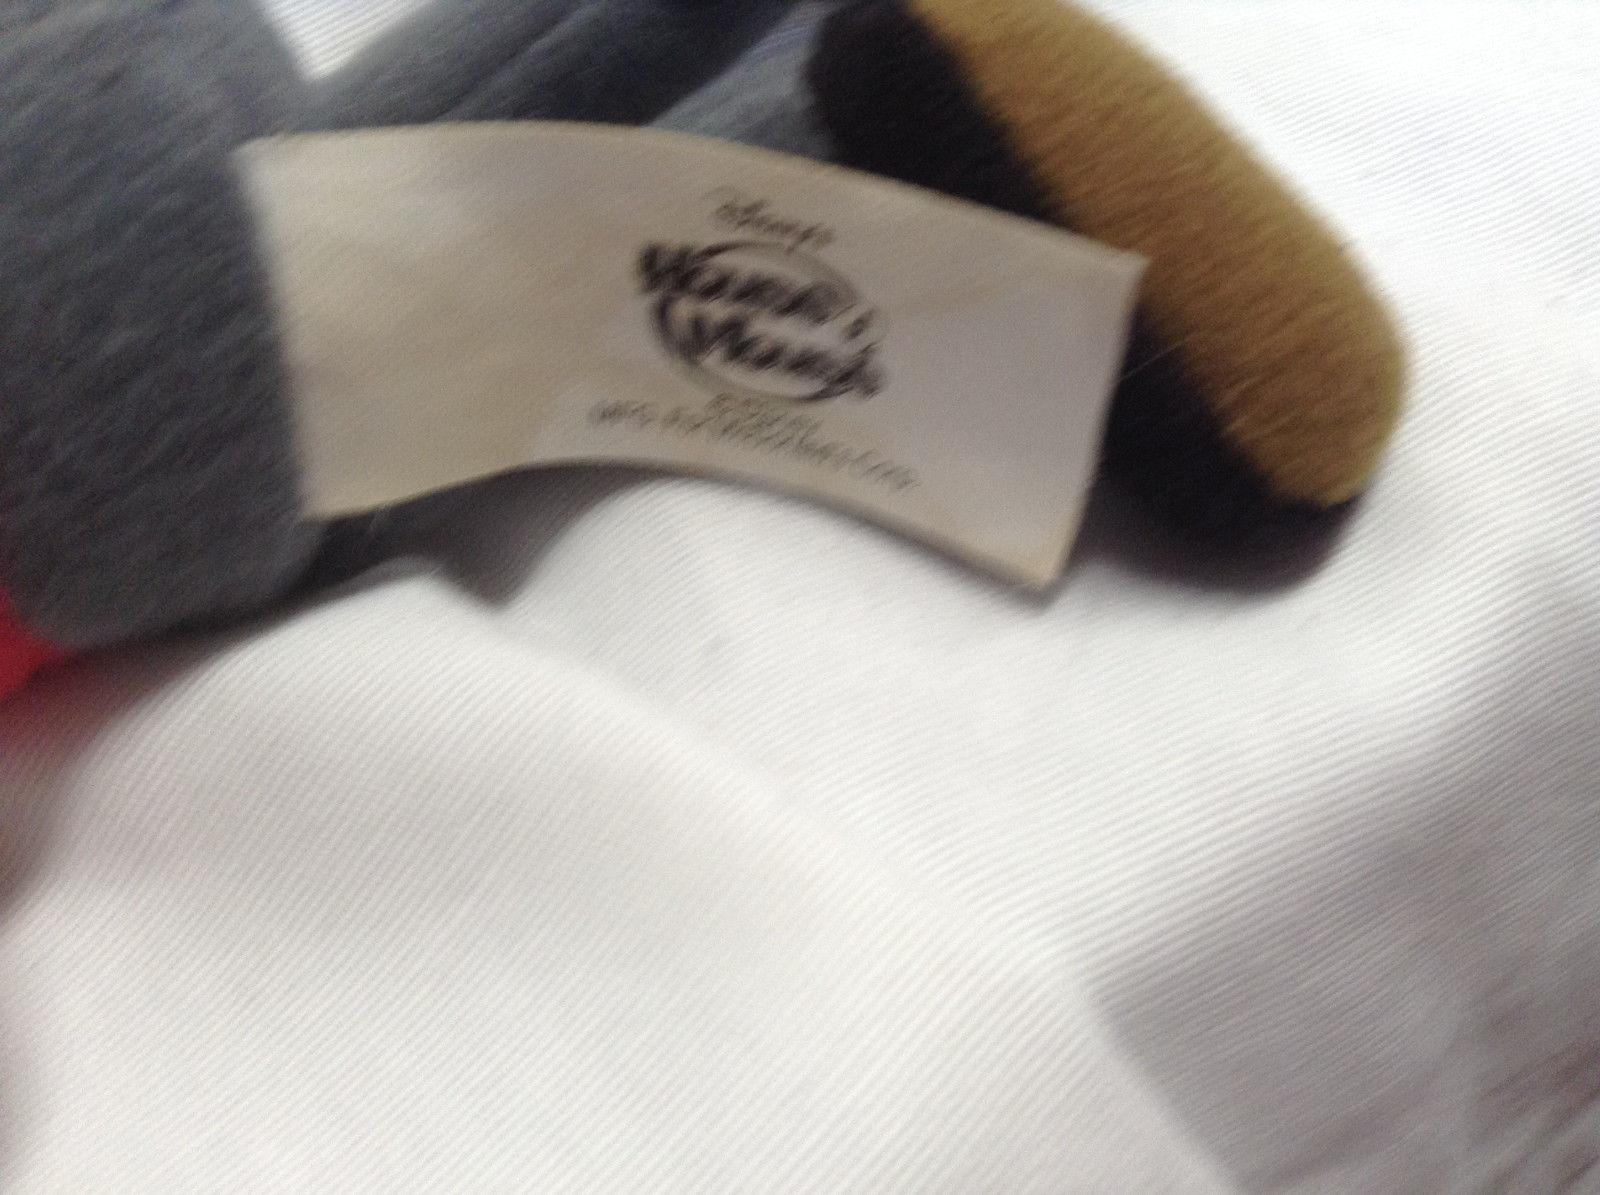 Disney Goofy Plush Doll Set of 2 House of Mouse 1 - apron 1 - suit